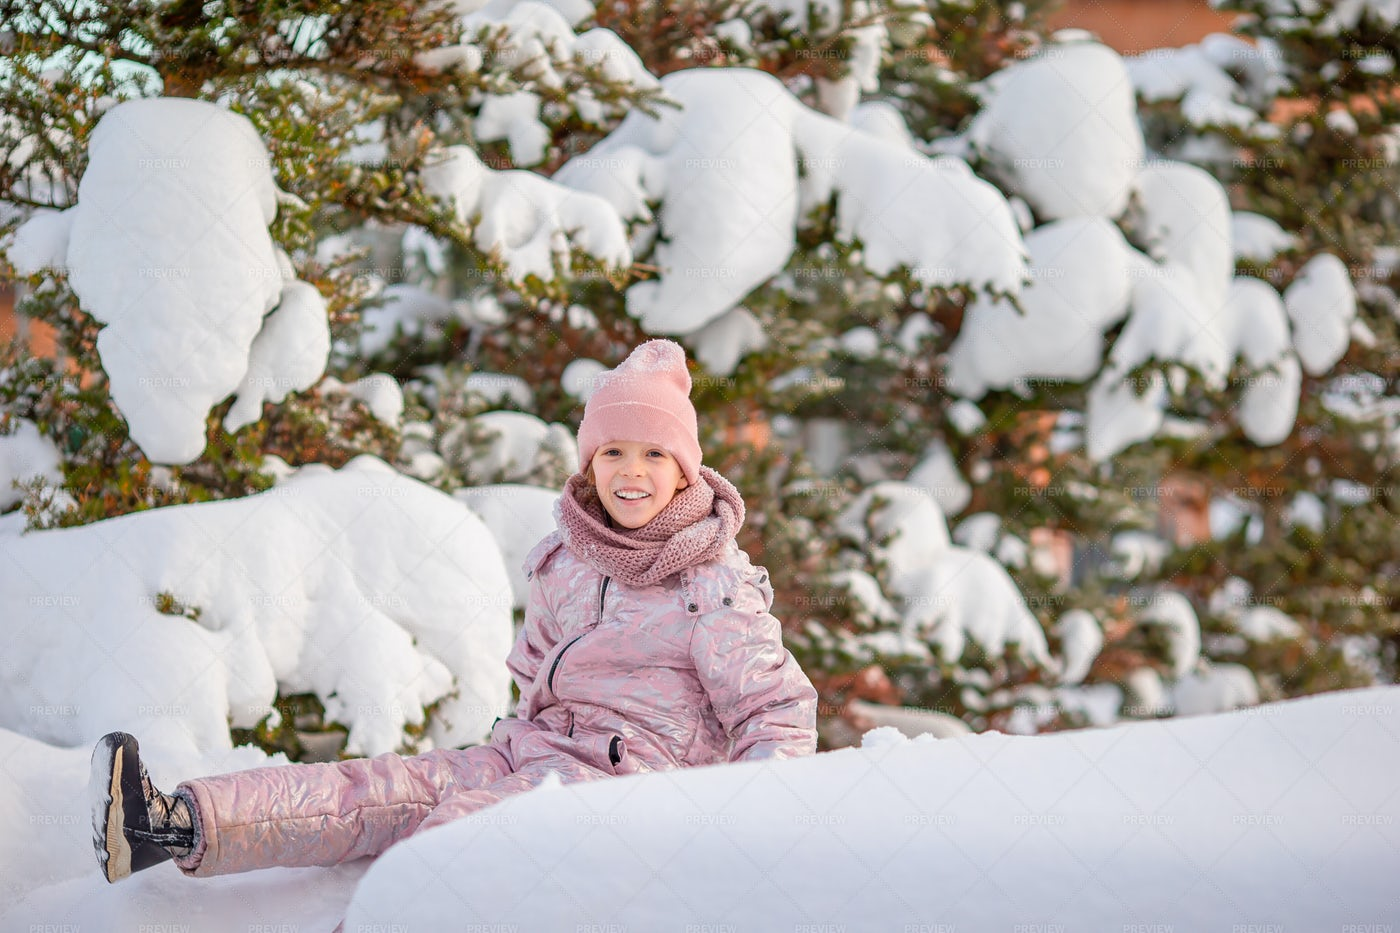 Kid In Winter: Stock Photos